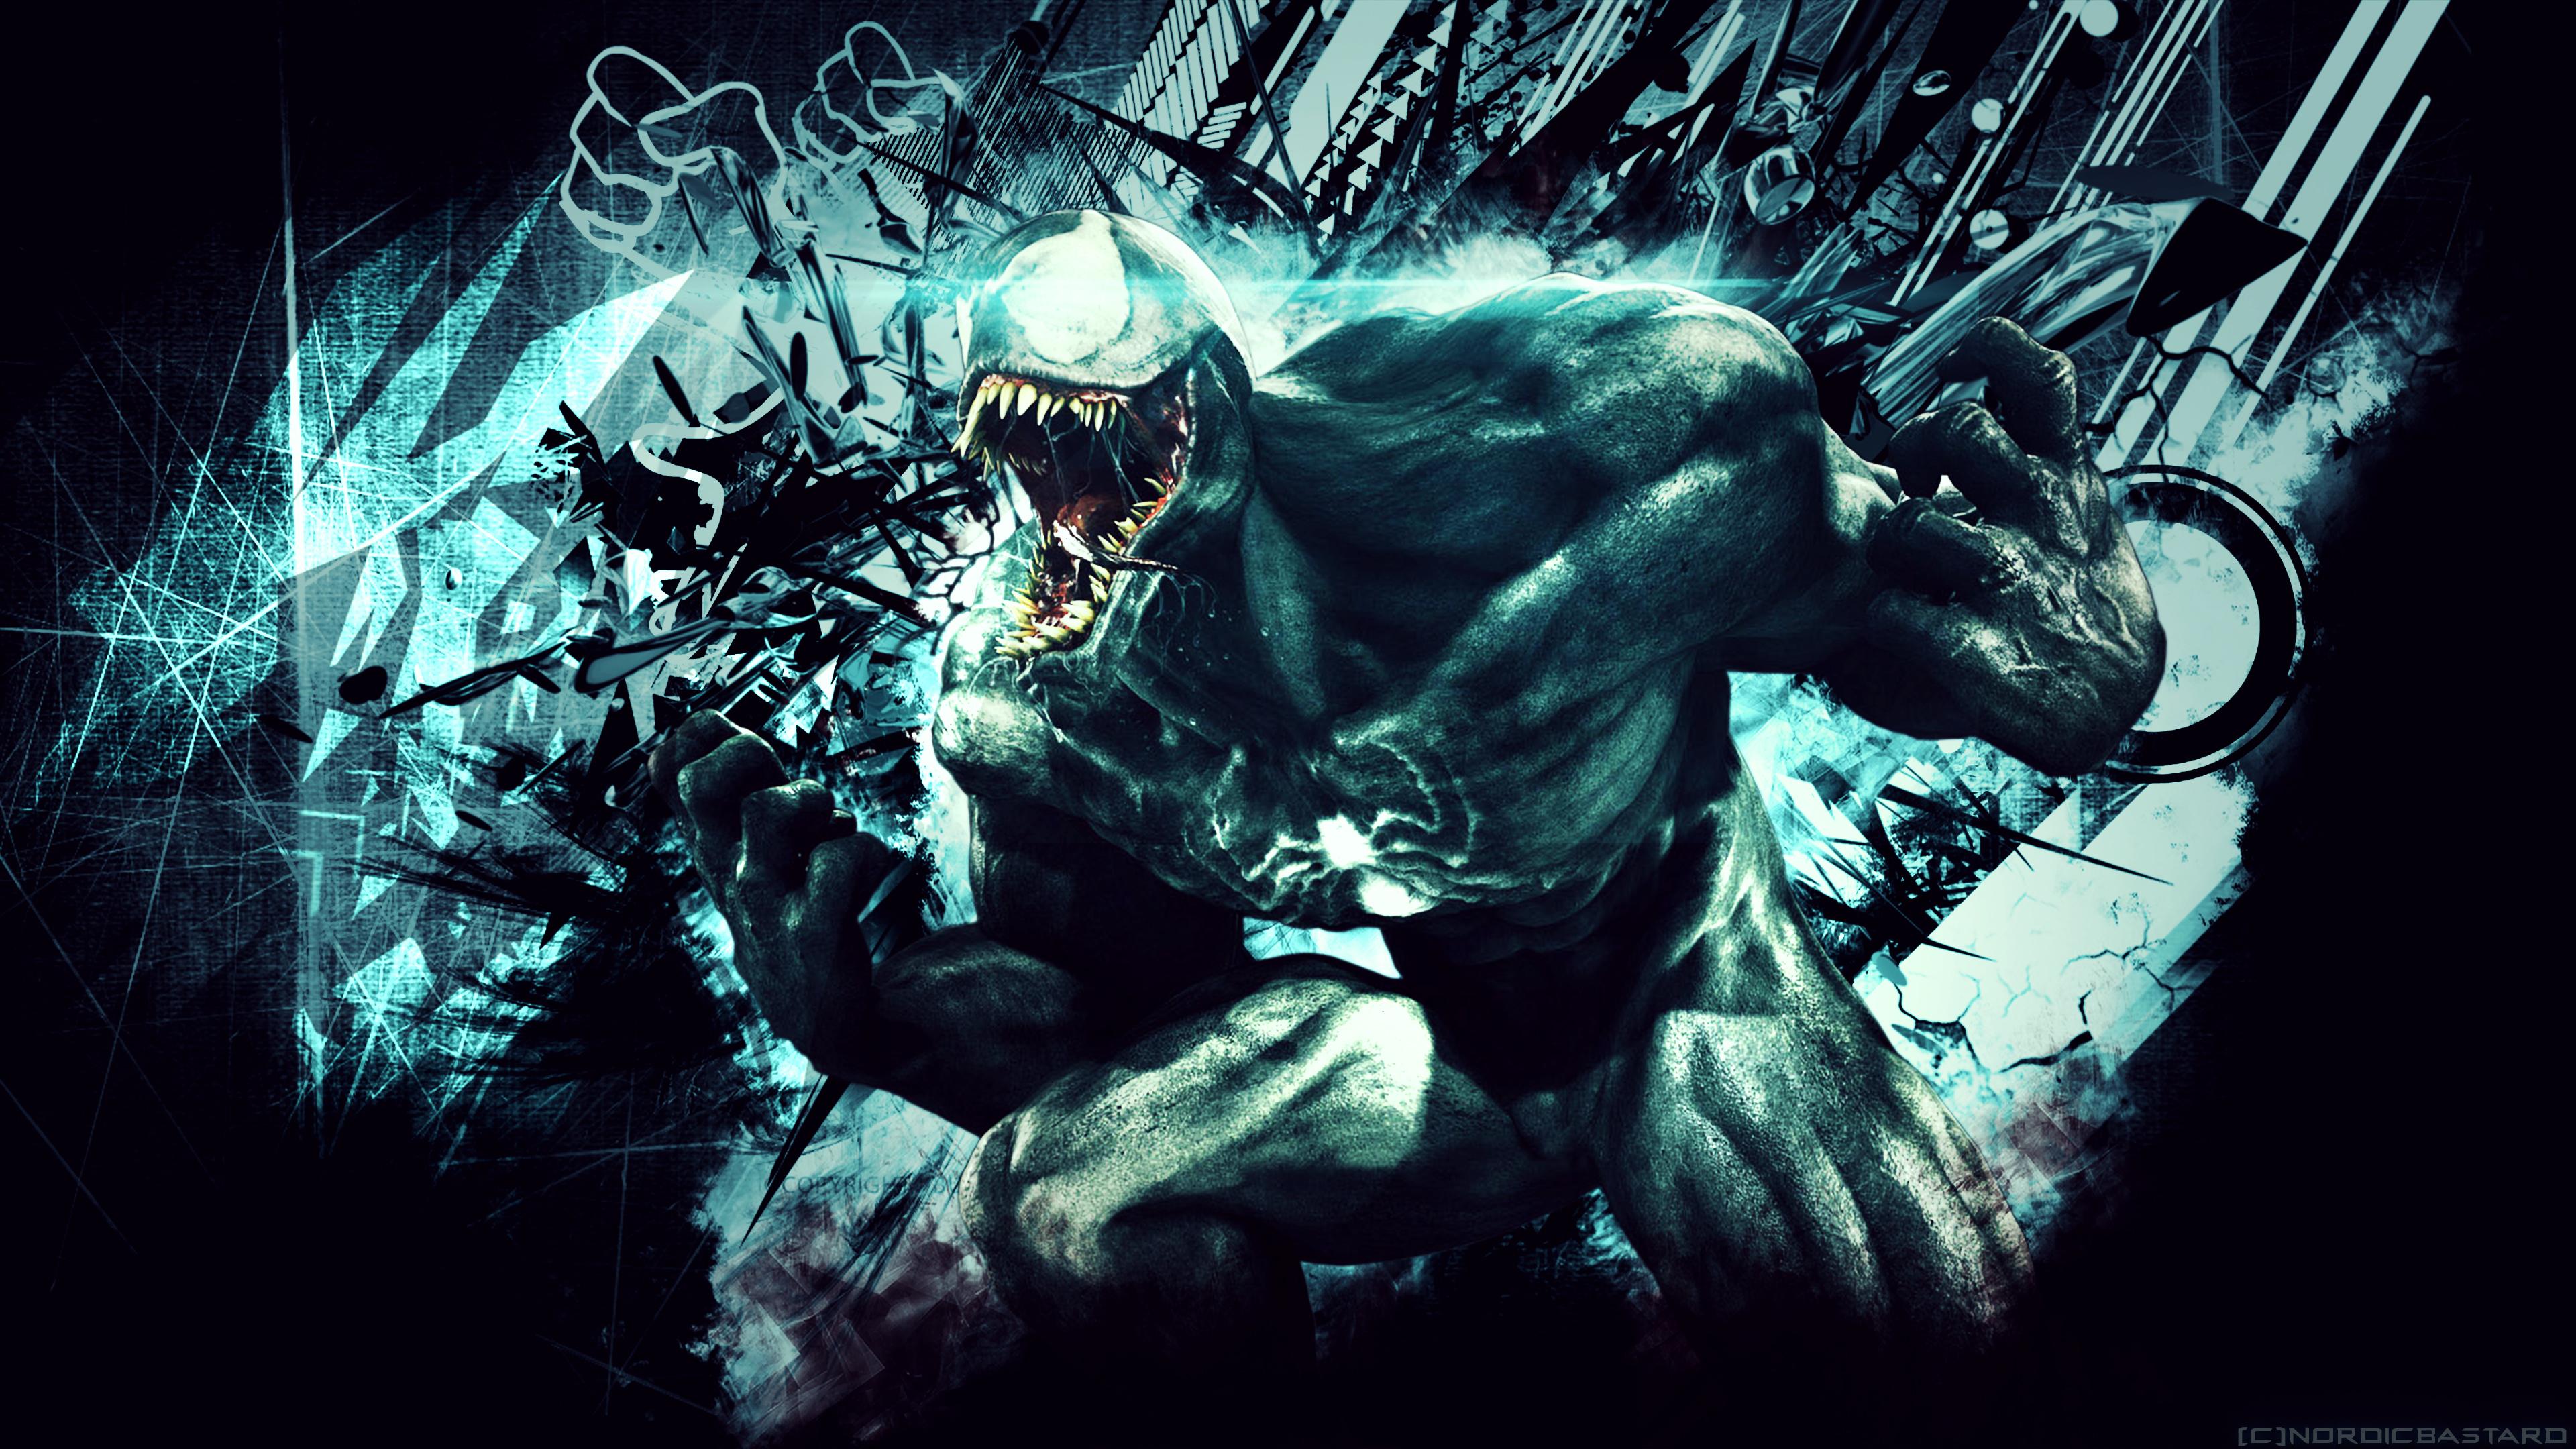 marvel venom 4k 1536524074 - Marvel Venom 4k - Venom wallpapers, supervillain wallpapers, superheroes wallpapers, hd-wallpapers, digital art wallpapers, artwork wallpapers, 4k-wallpapers